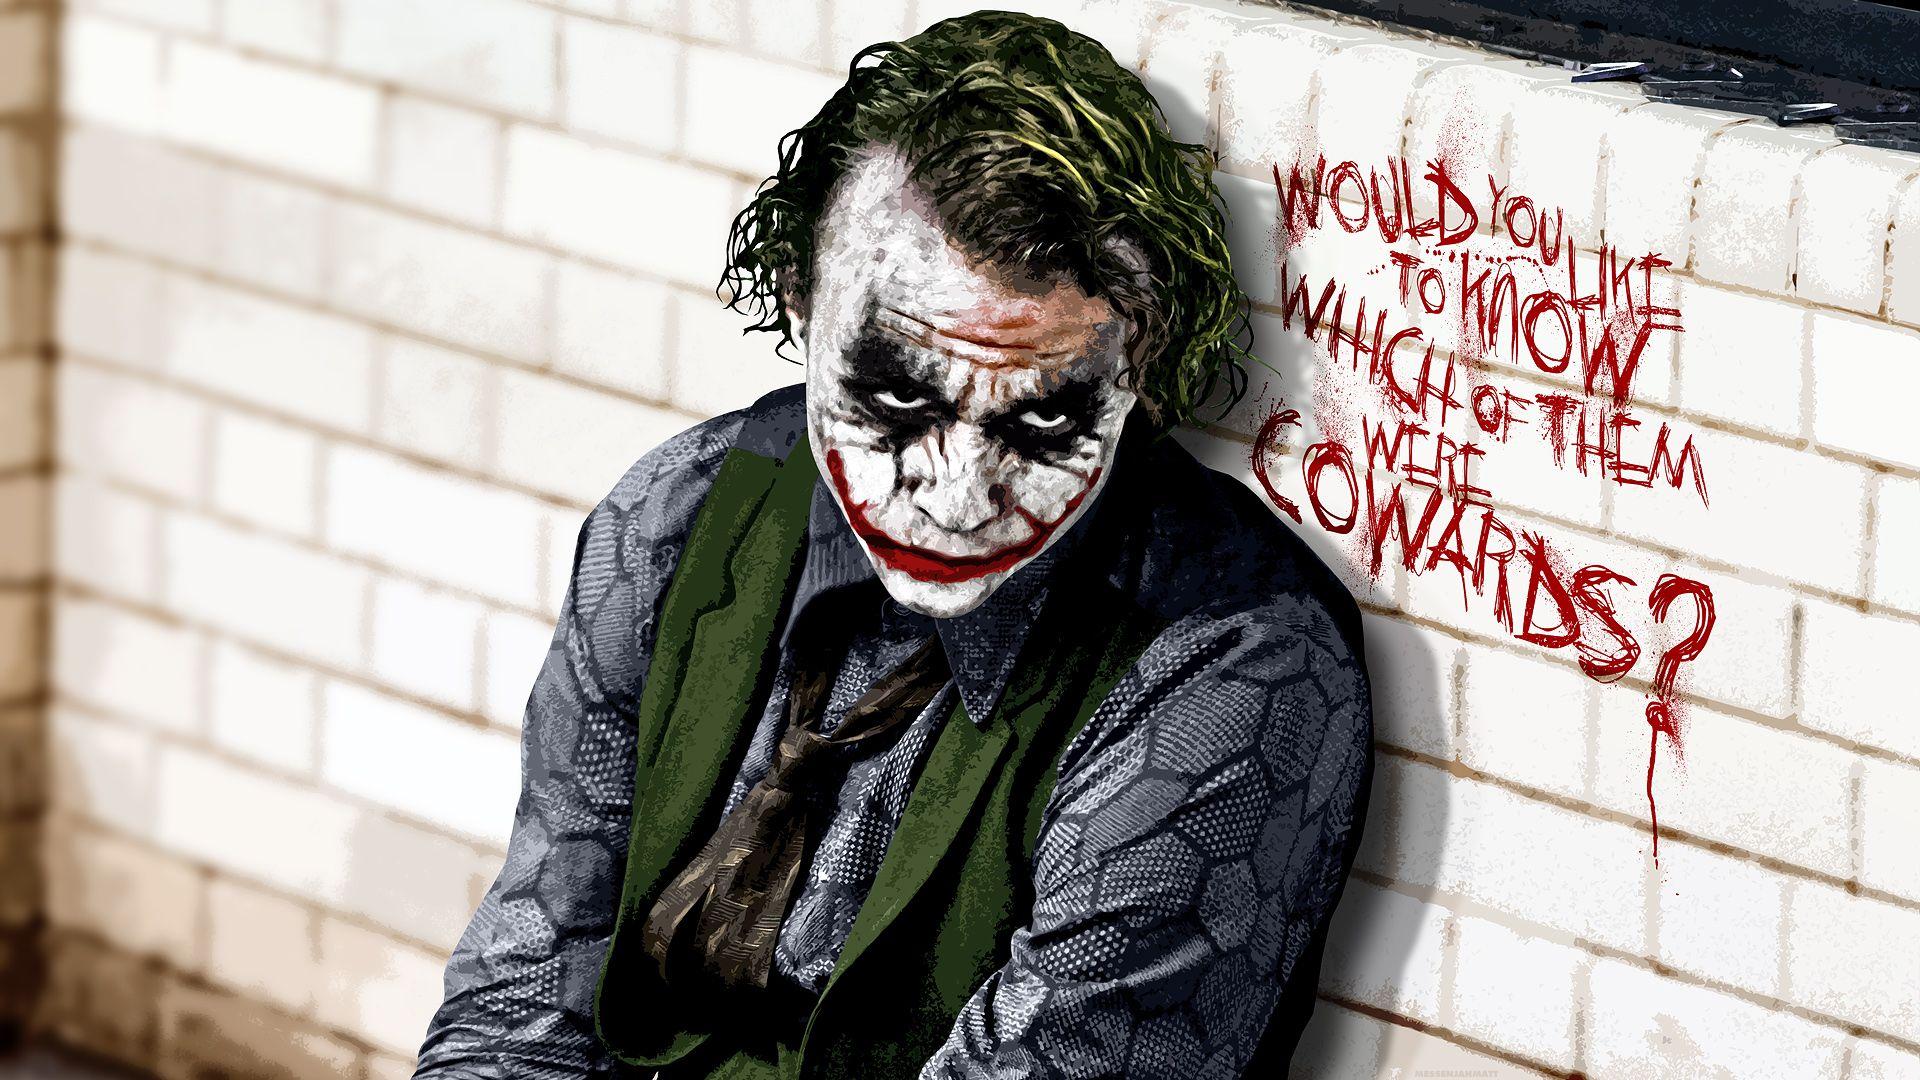 Heat Ledger Joker Joker Caballero De La Noche Poster Del